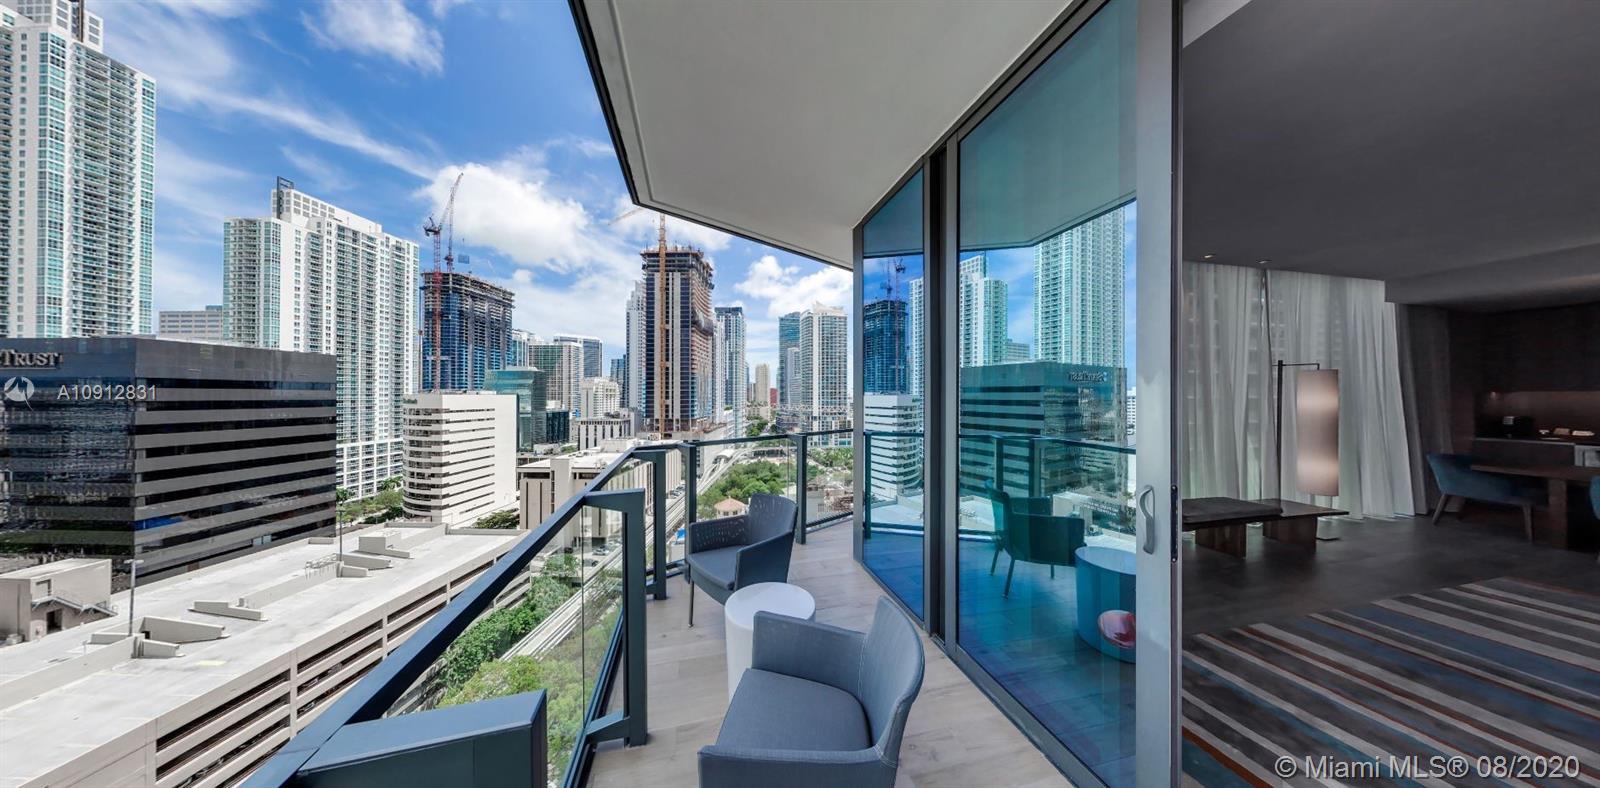 788  Brickell Plaza #903 For Sale A10912831, FL